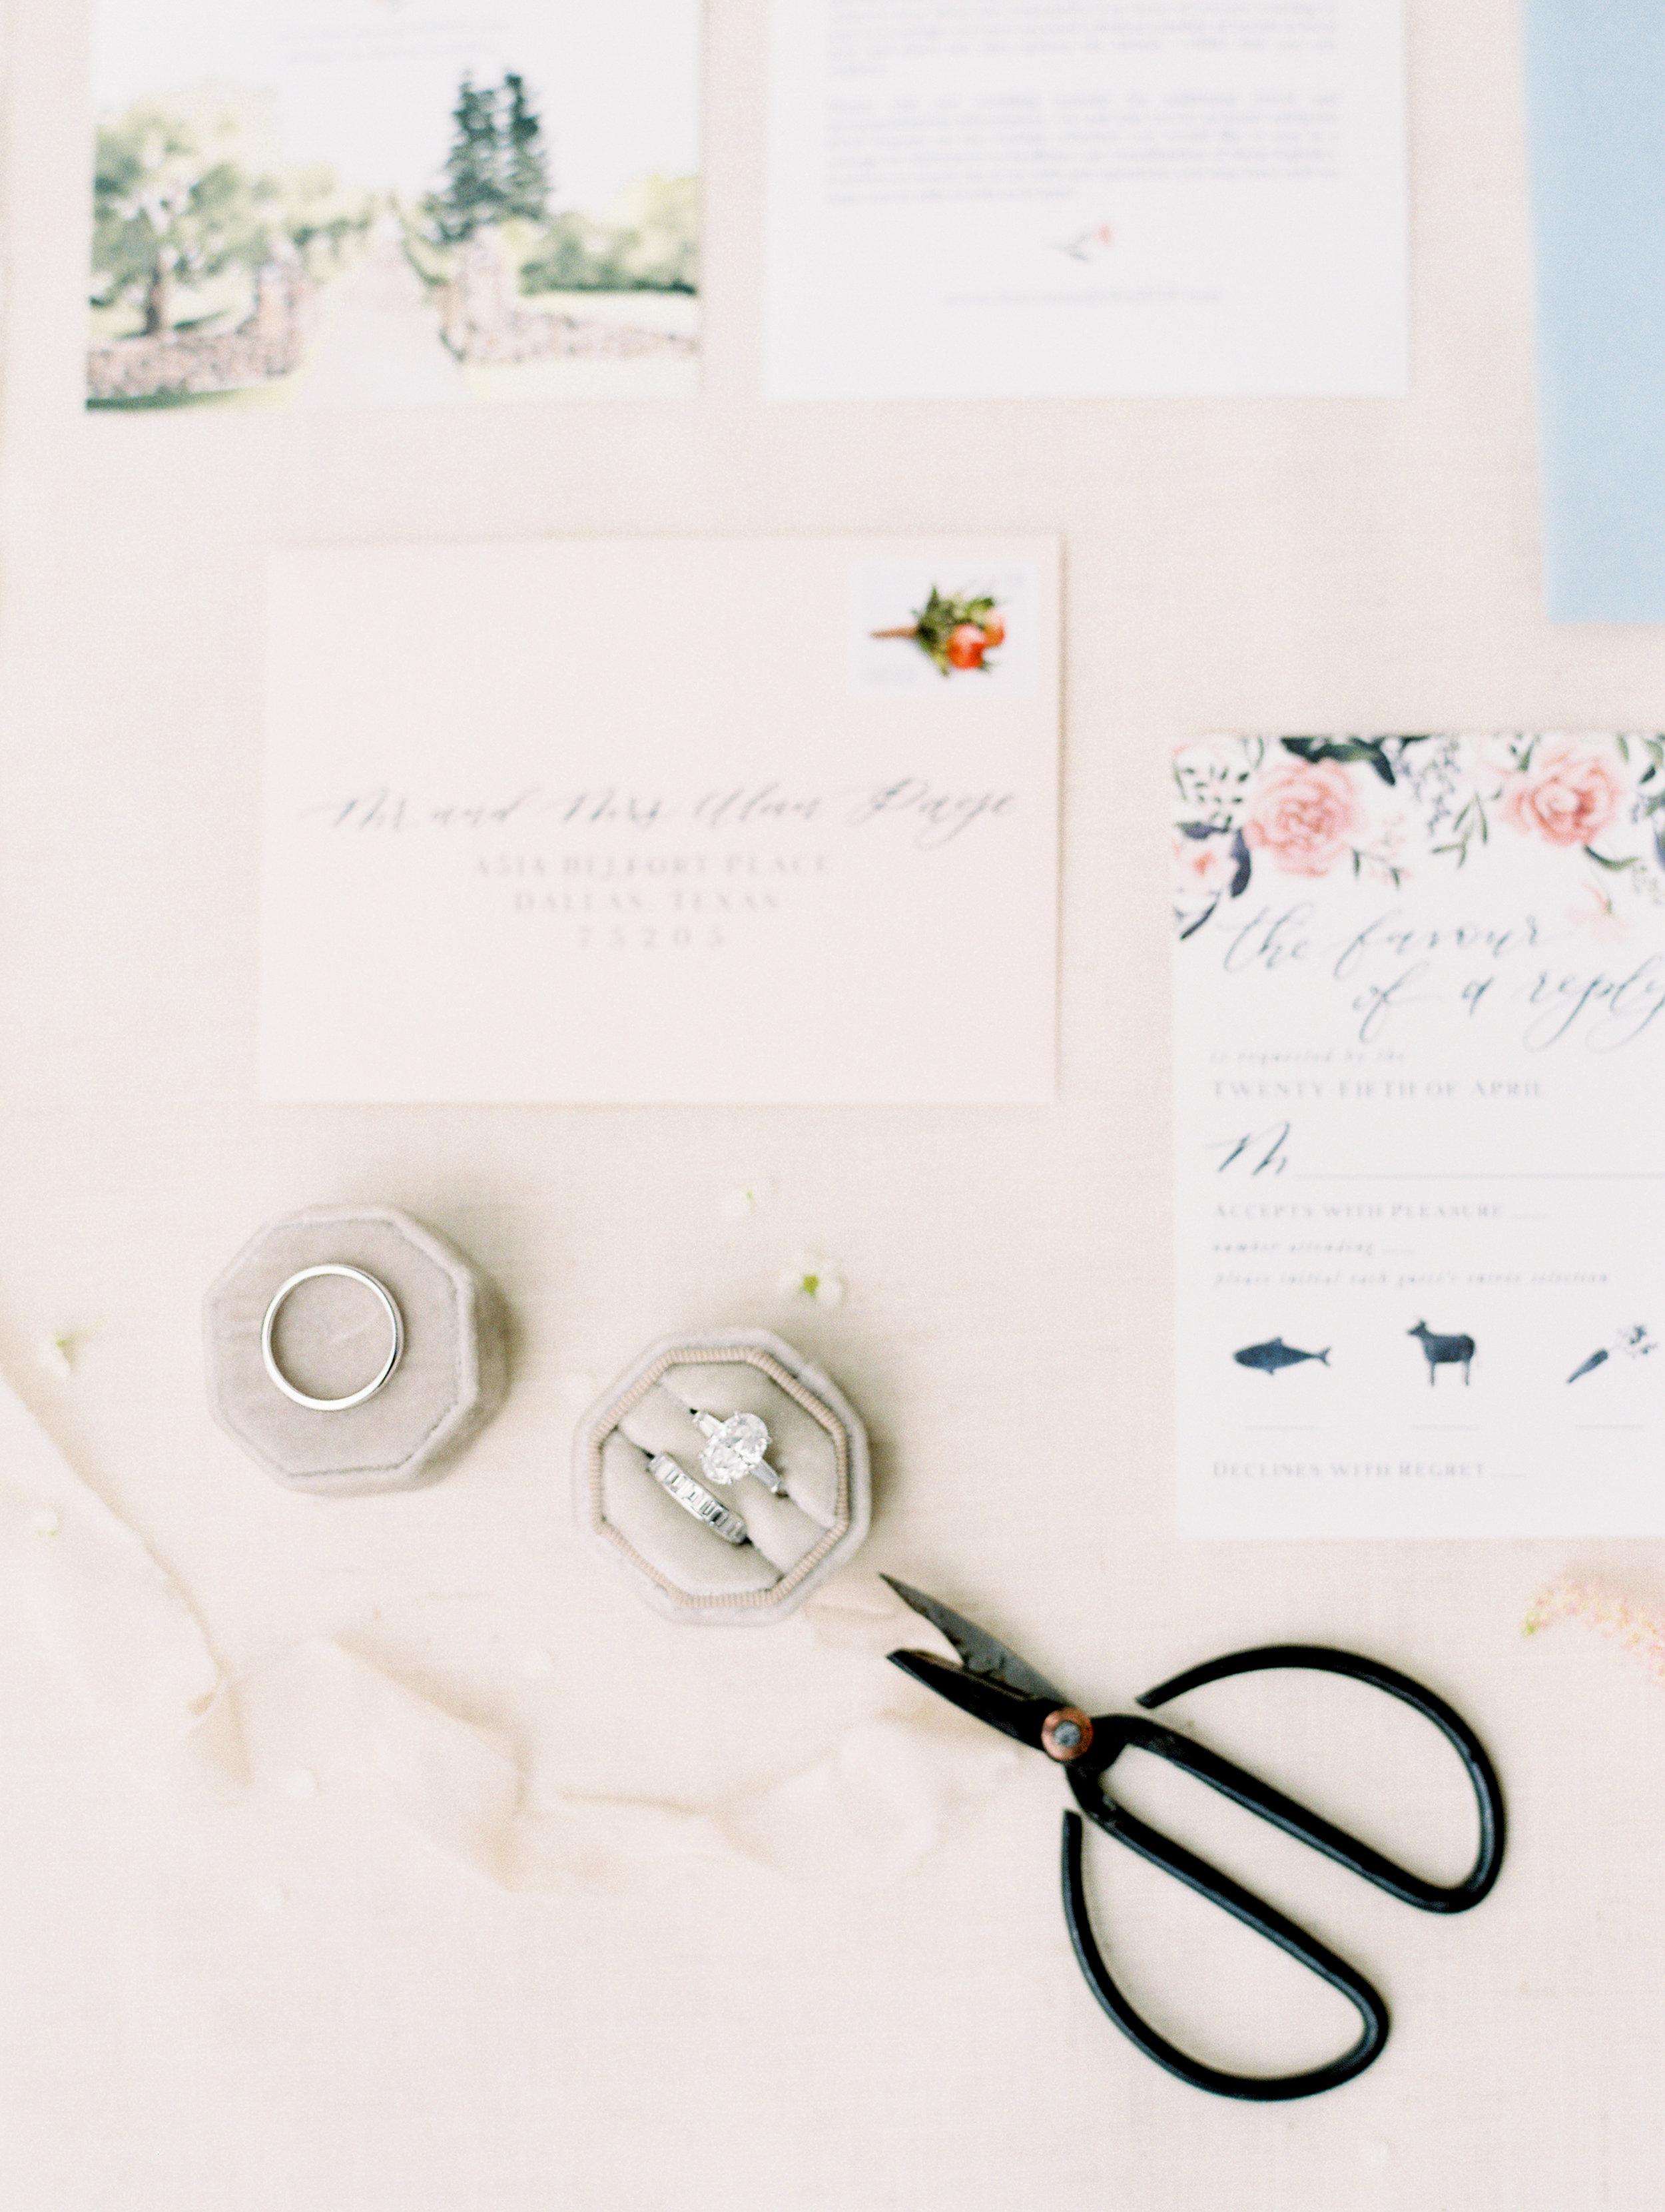 Coffman+Wedding+Details-37.jpg